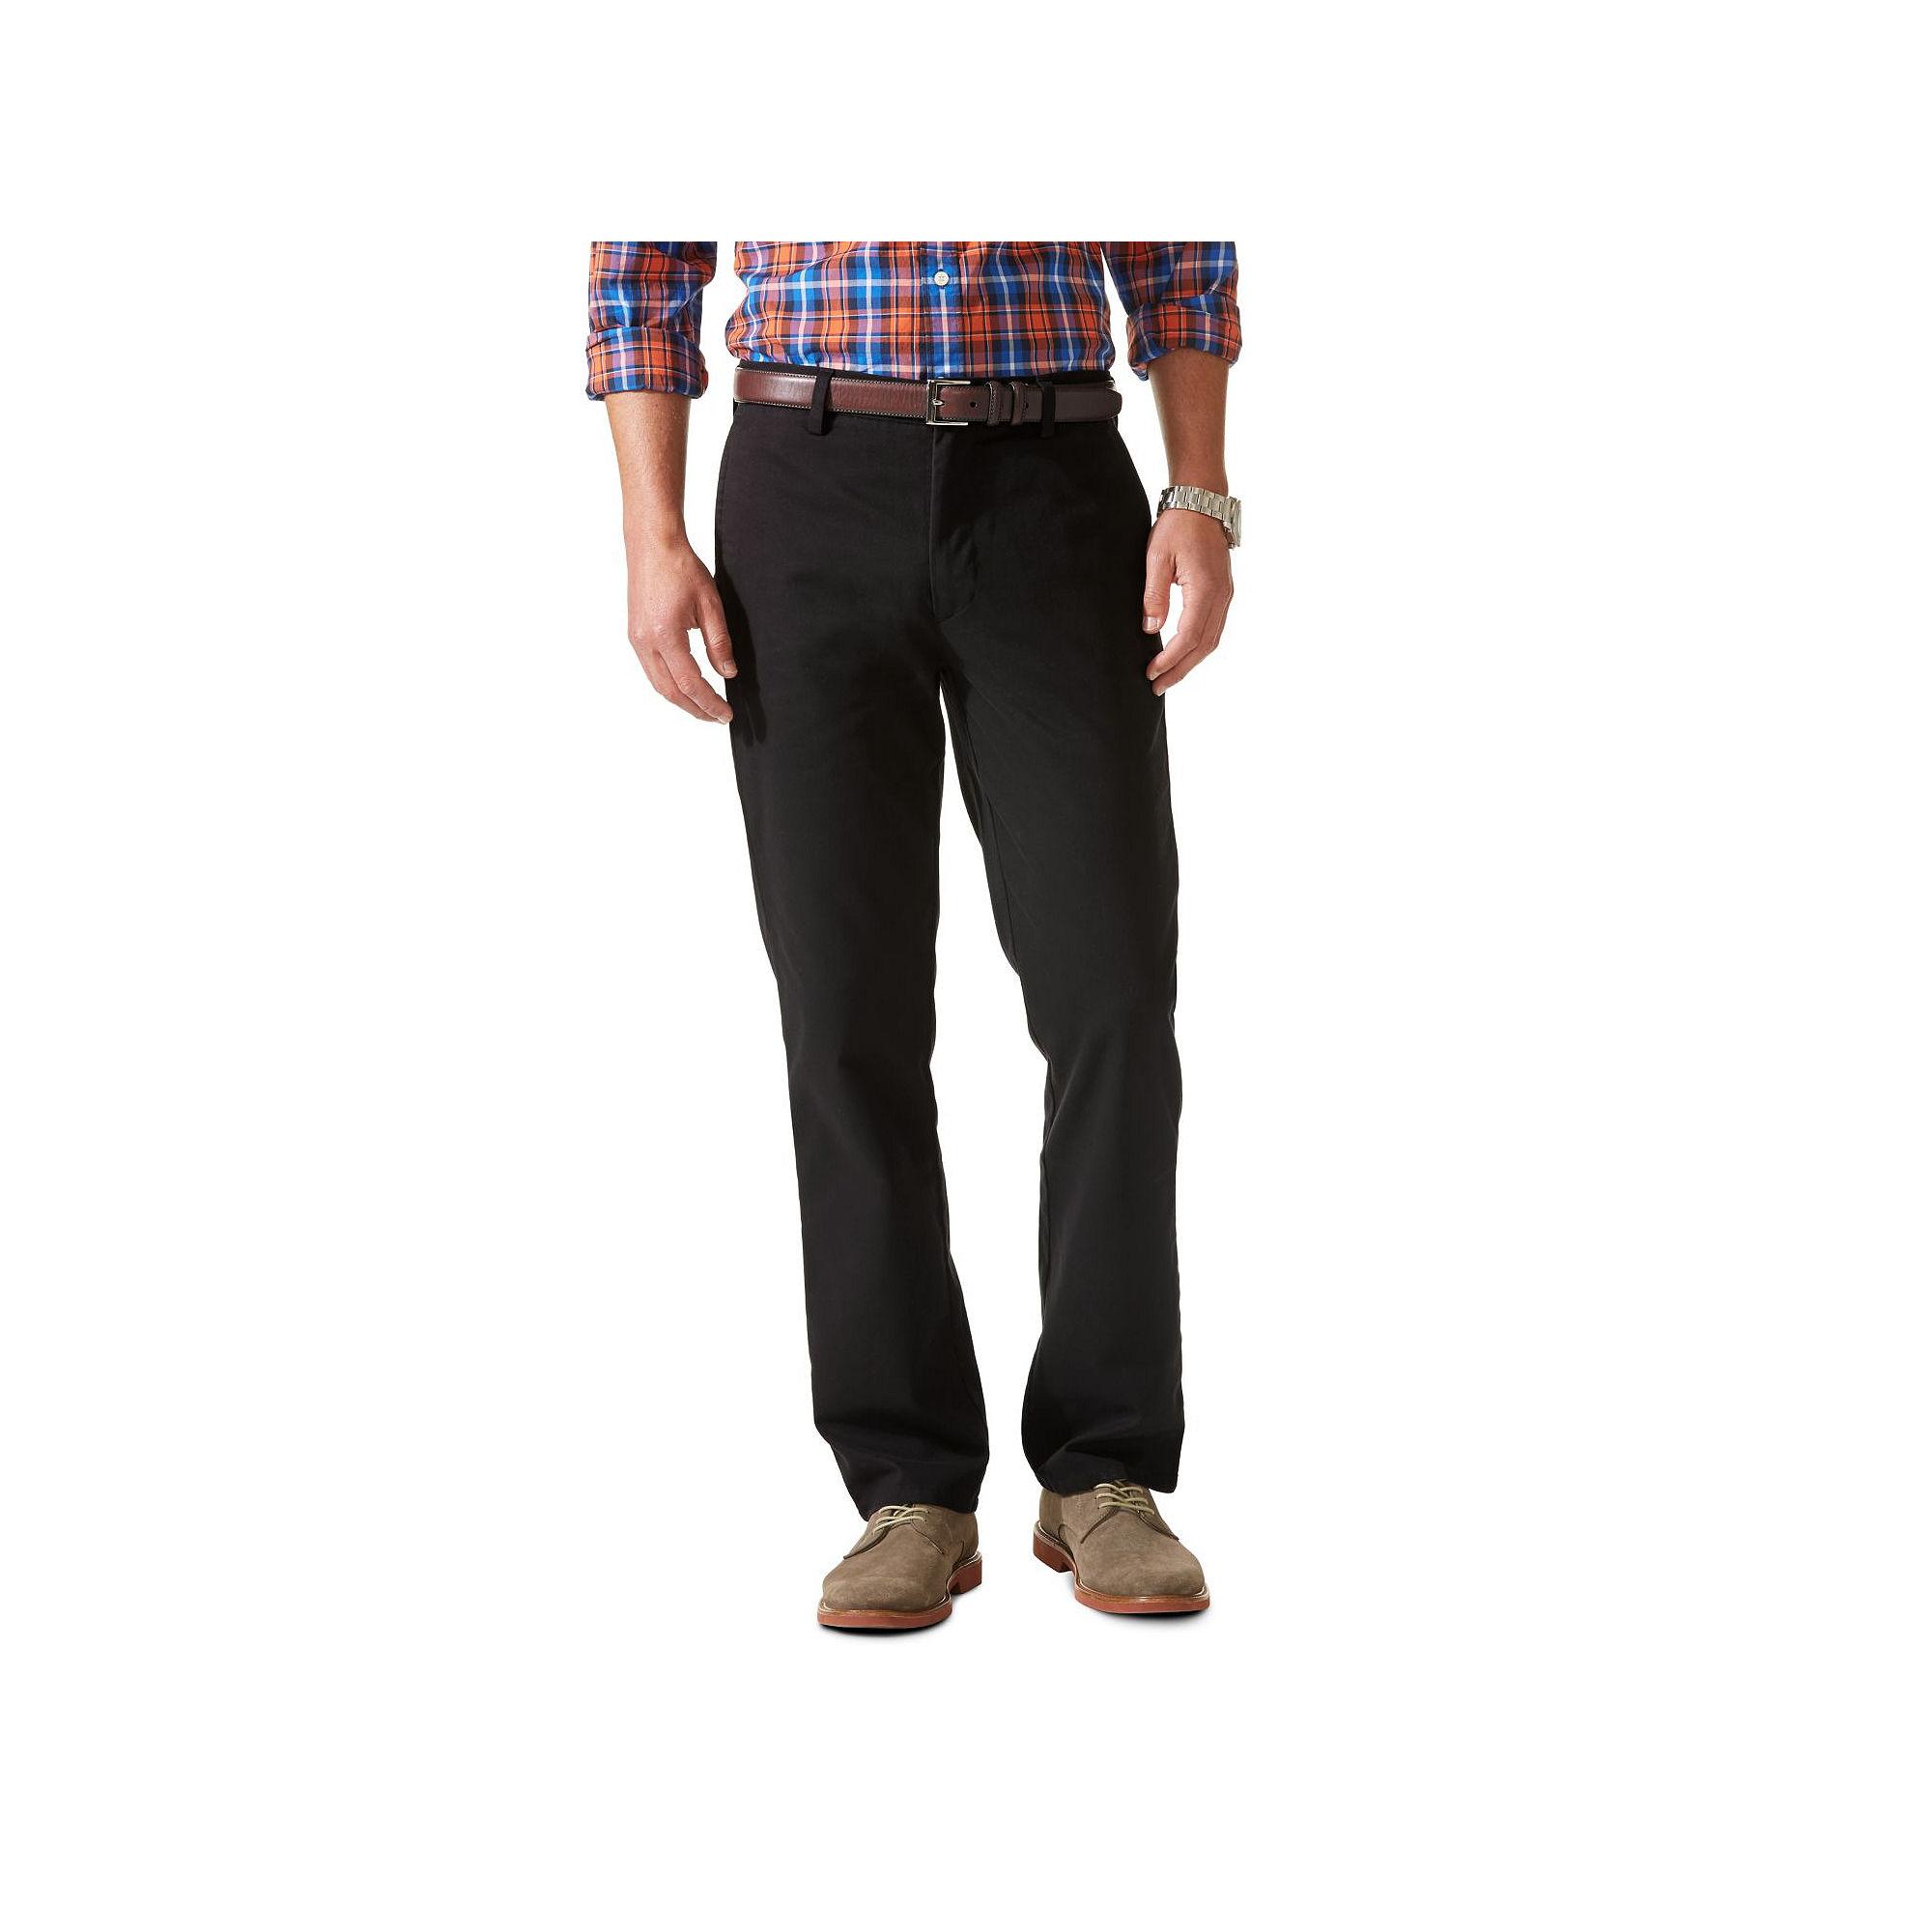 Dockers D1 Easy Khaki Slim-Fit Pants